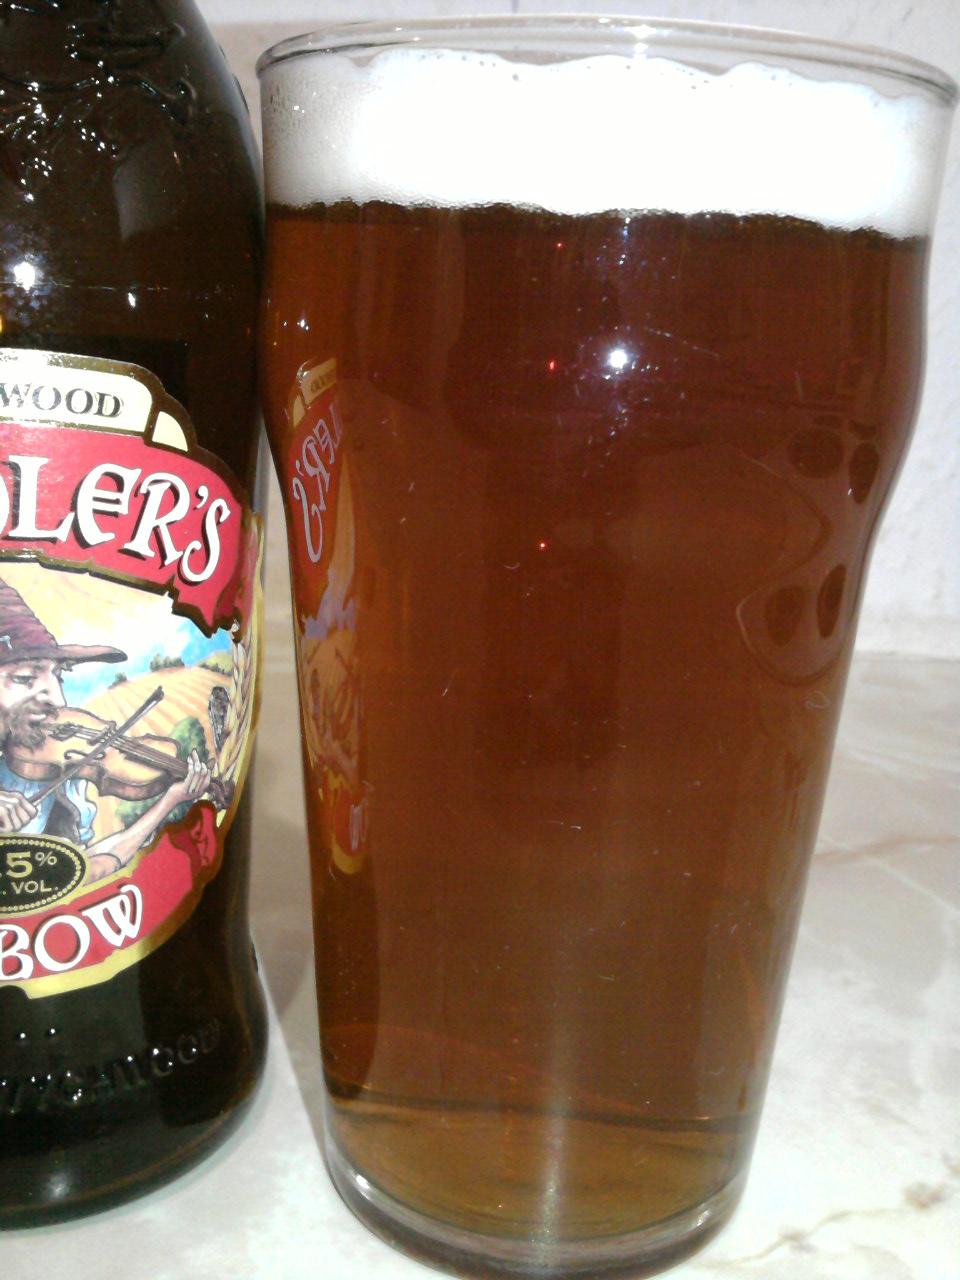 Wychwood Fiddler's Elbow poured into a glass